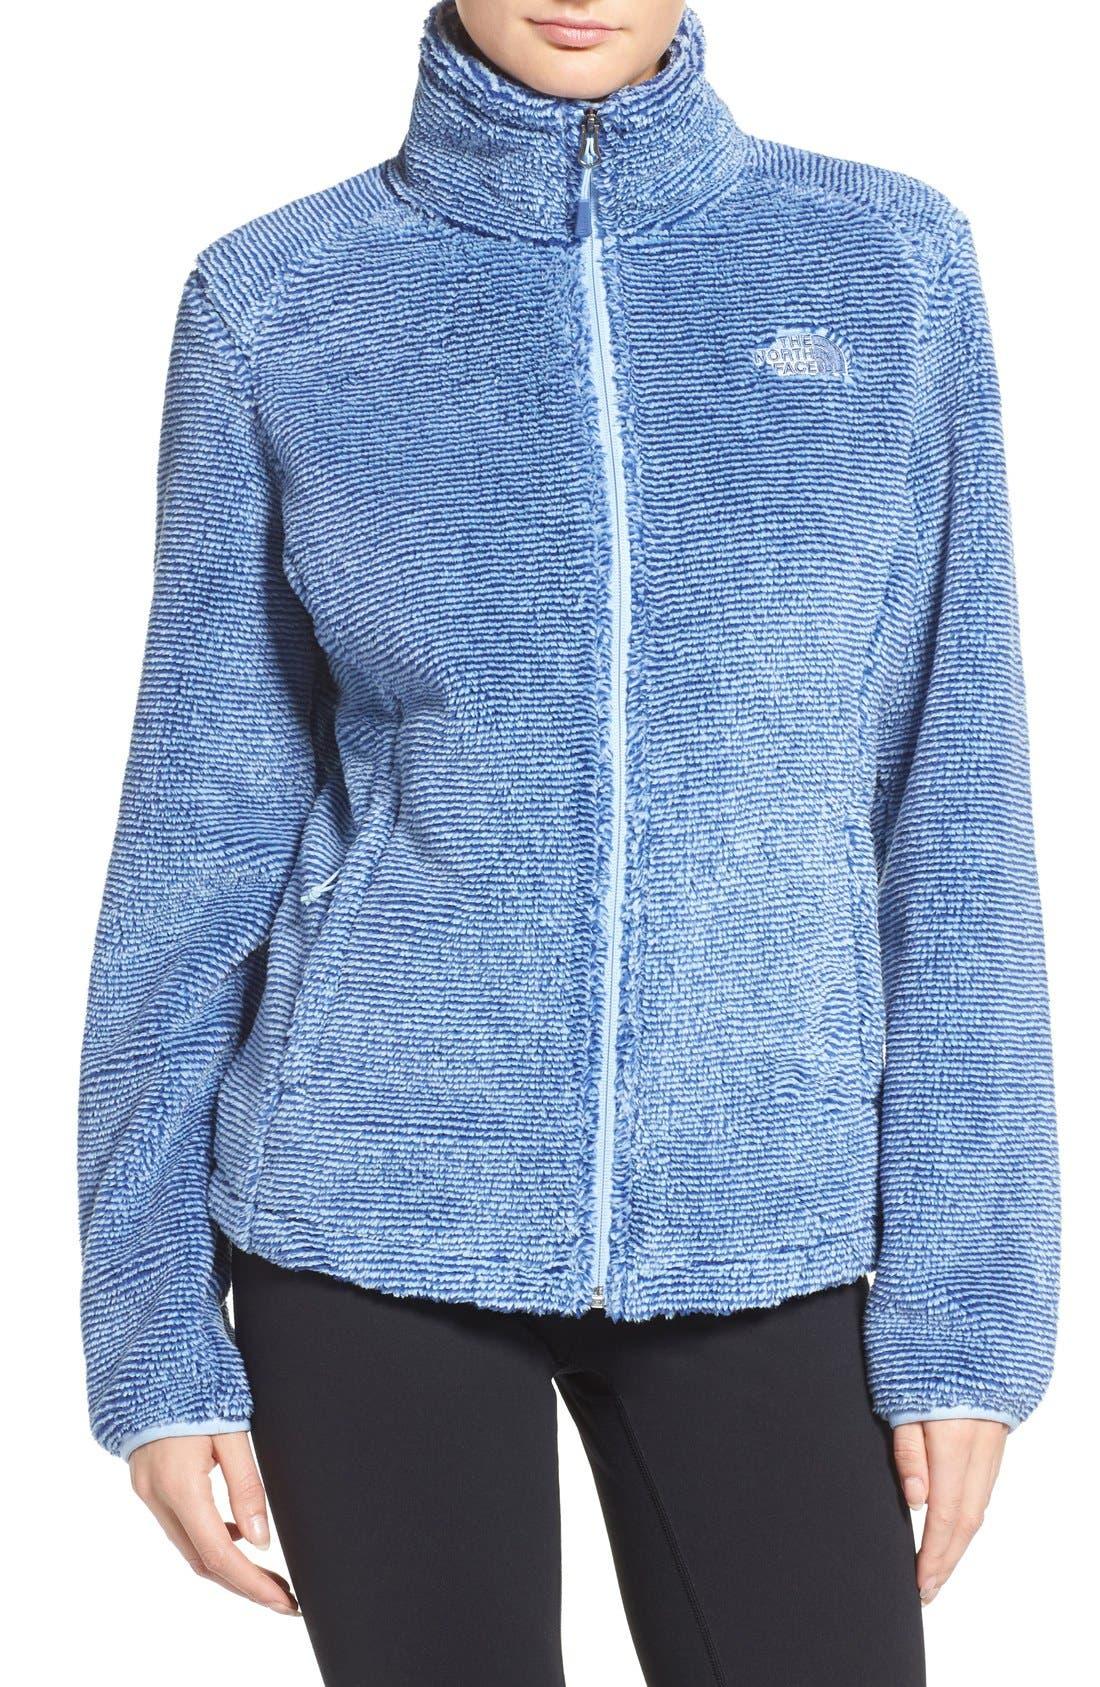 Main Image - The North Face 'Osito 2' Jacket